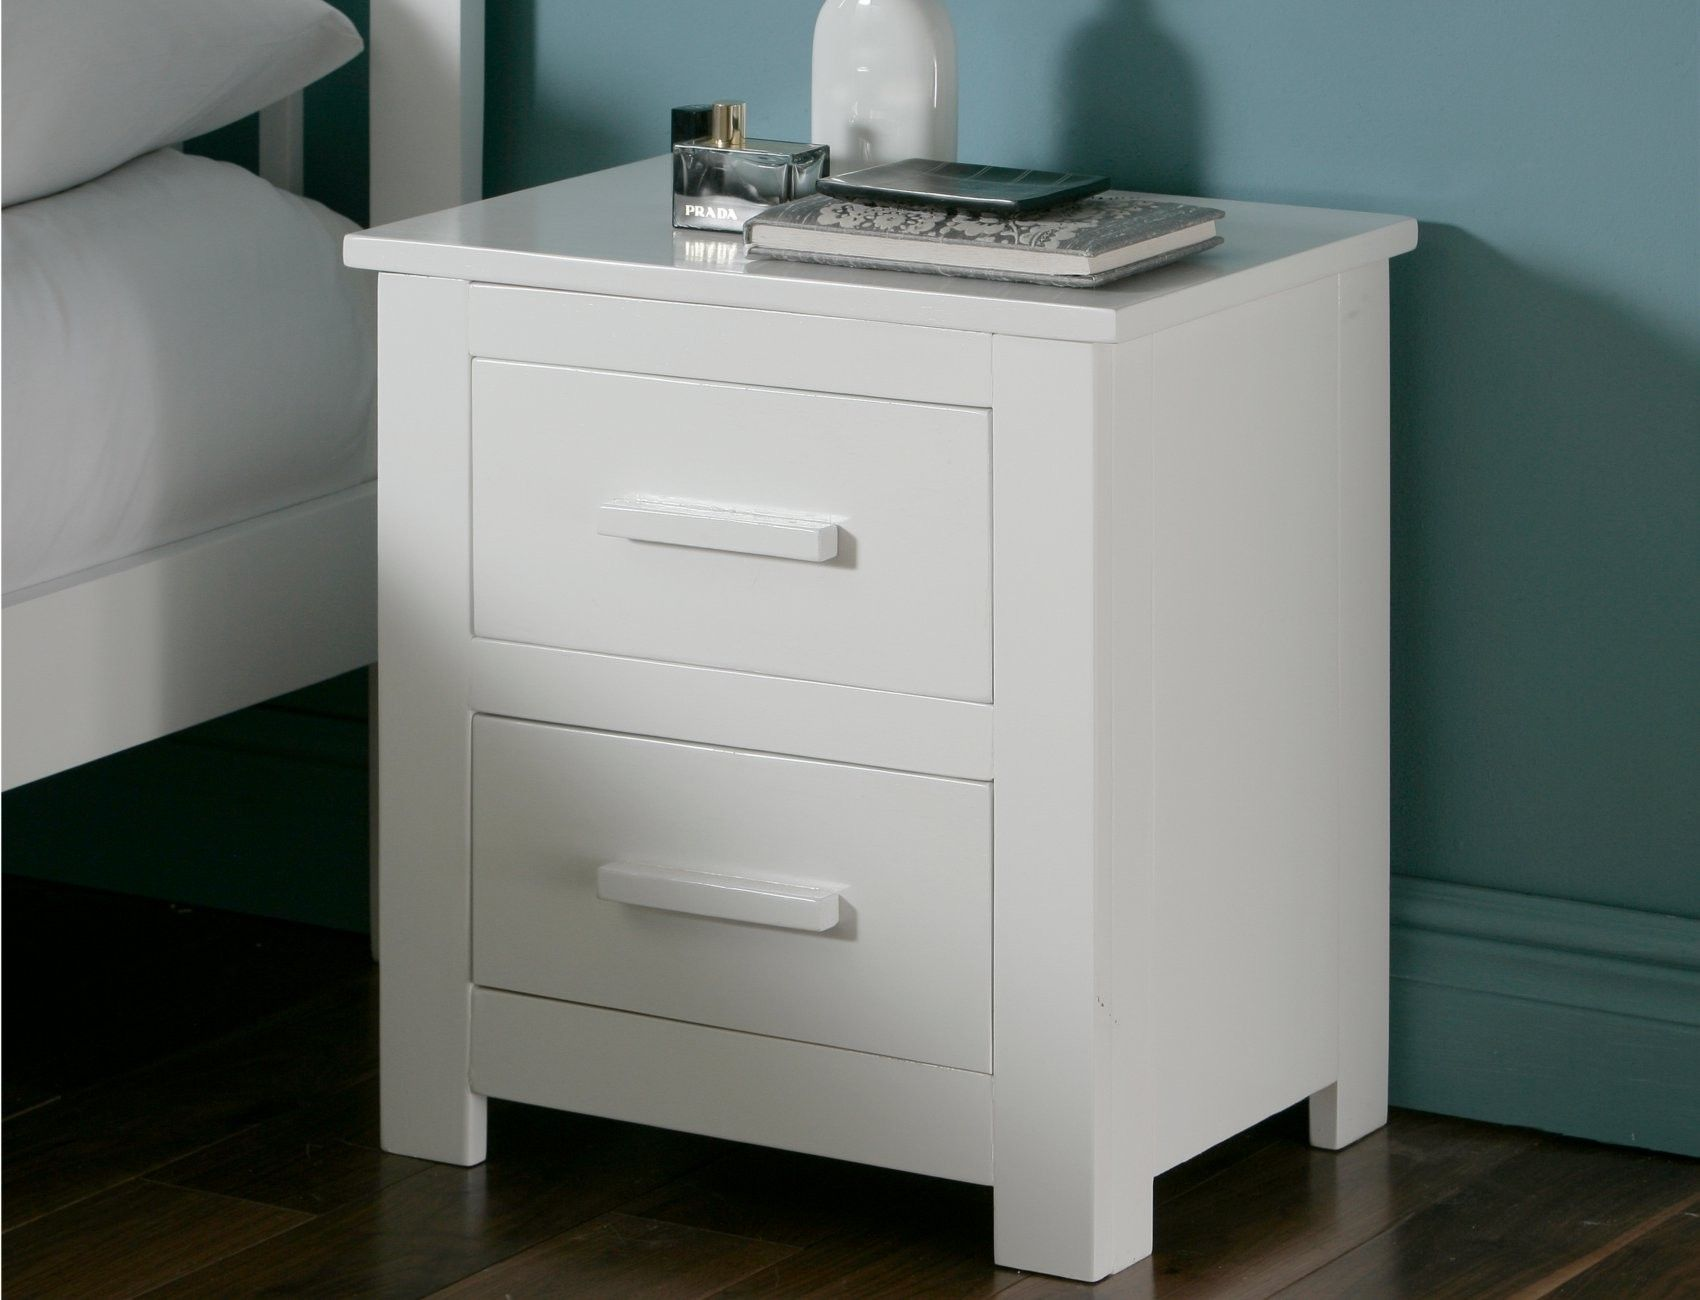 Small Bedside Tables Canada | Master Bedroom | Pinterest | Blue ...